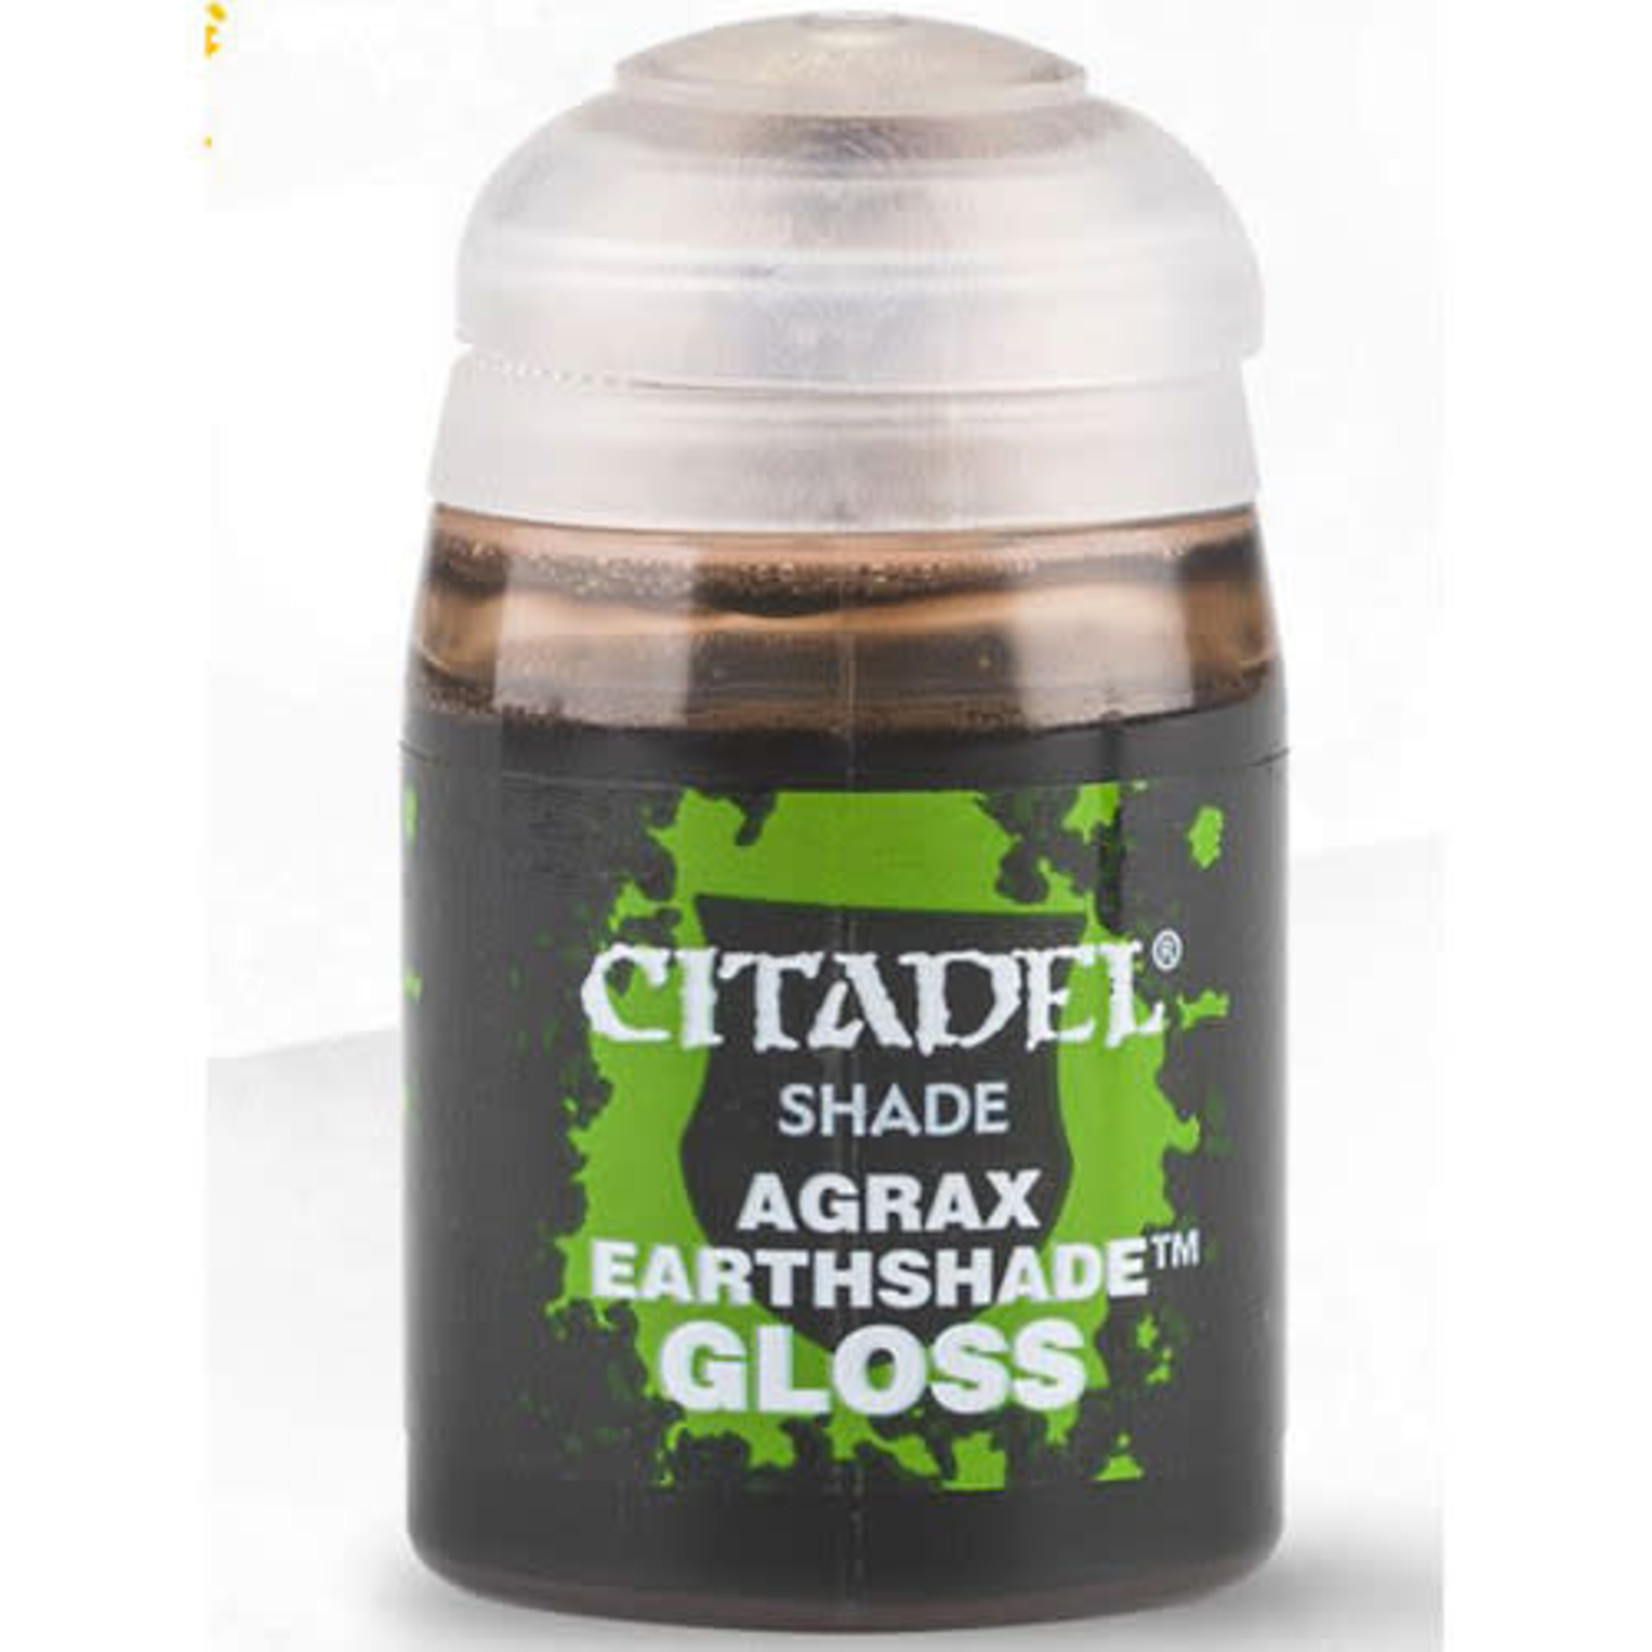 Games Workshop Citadel Paint: Agrax Earthshade 24ml Gloss